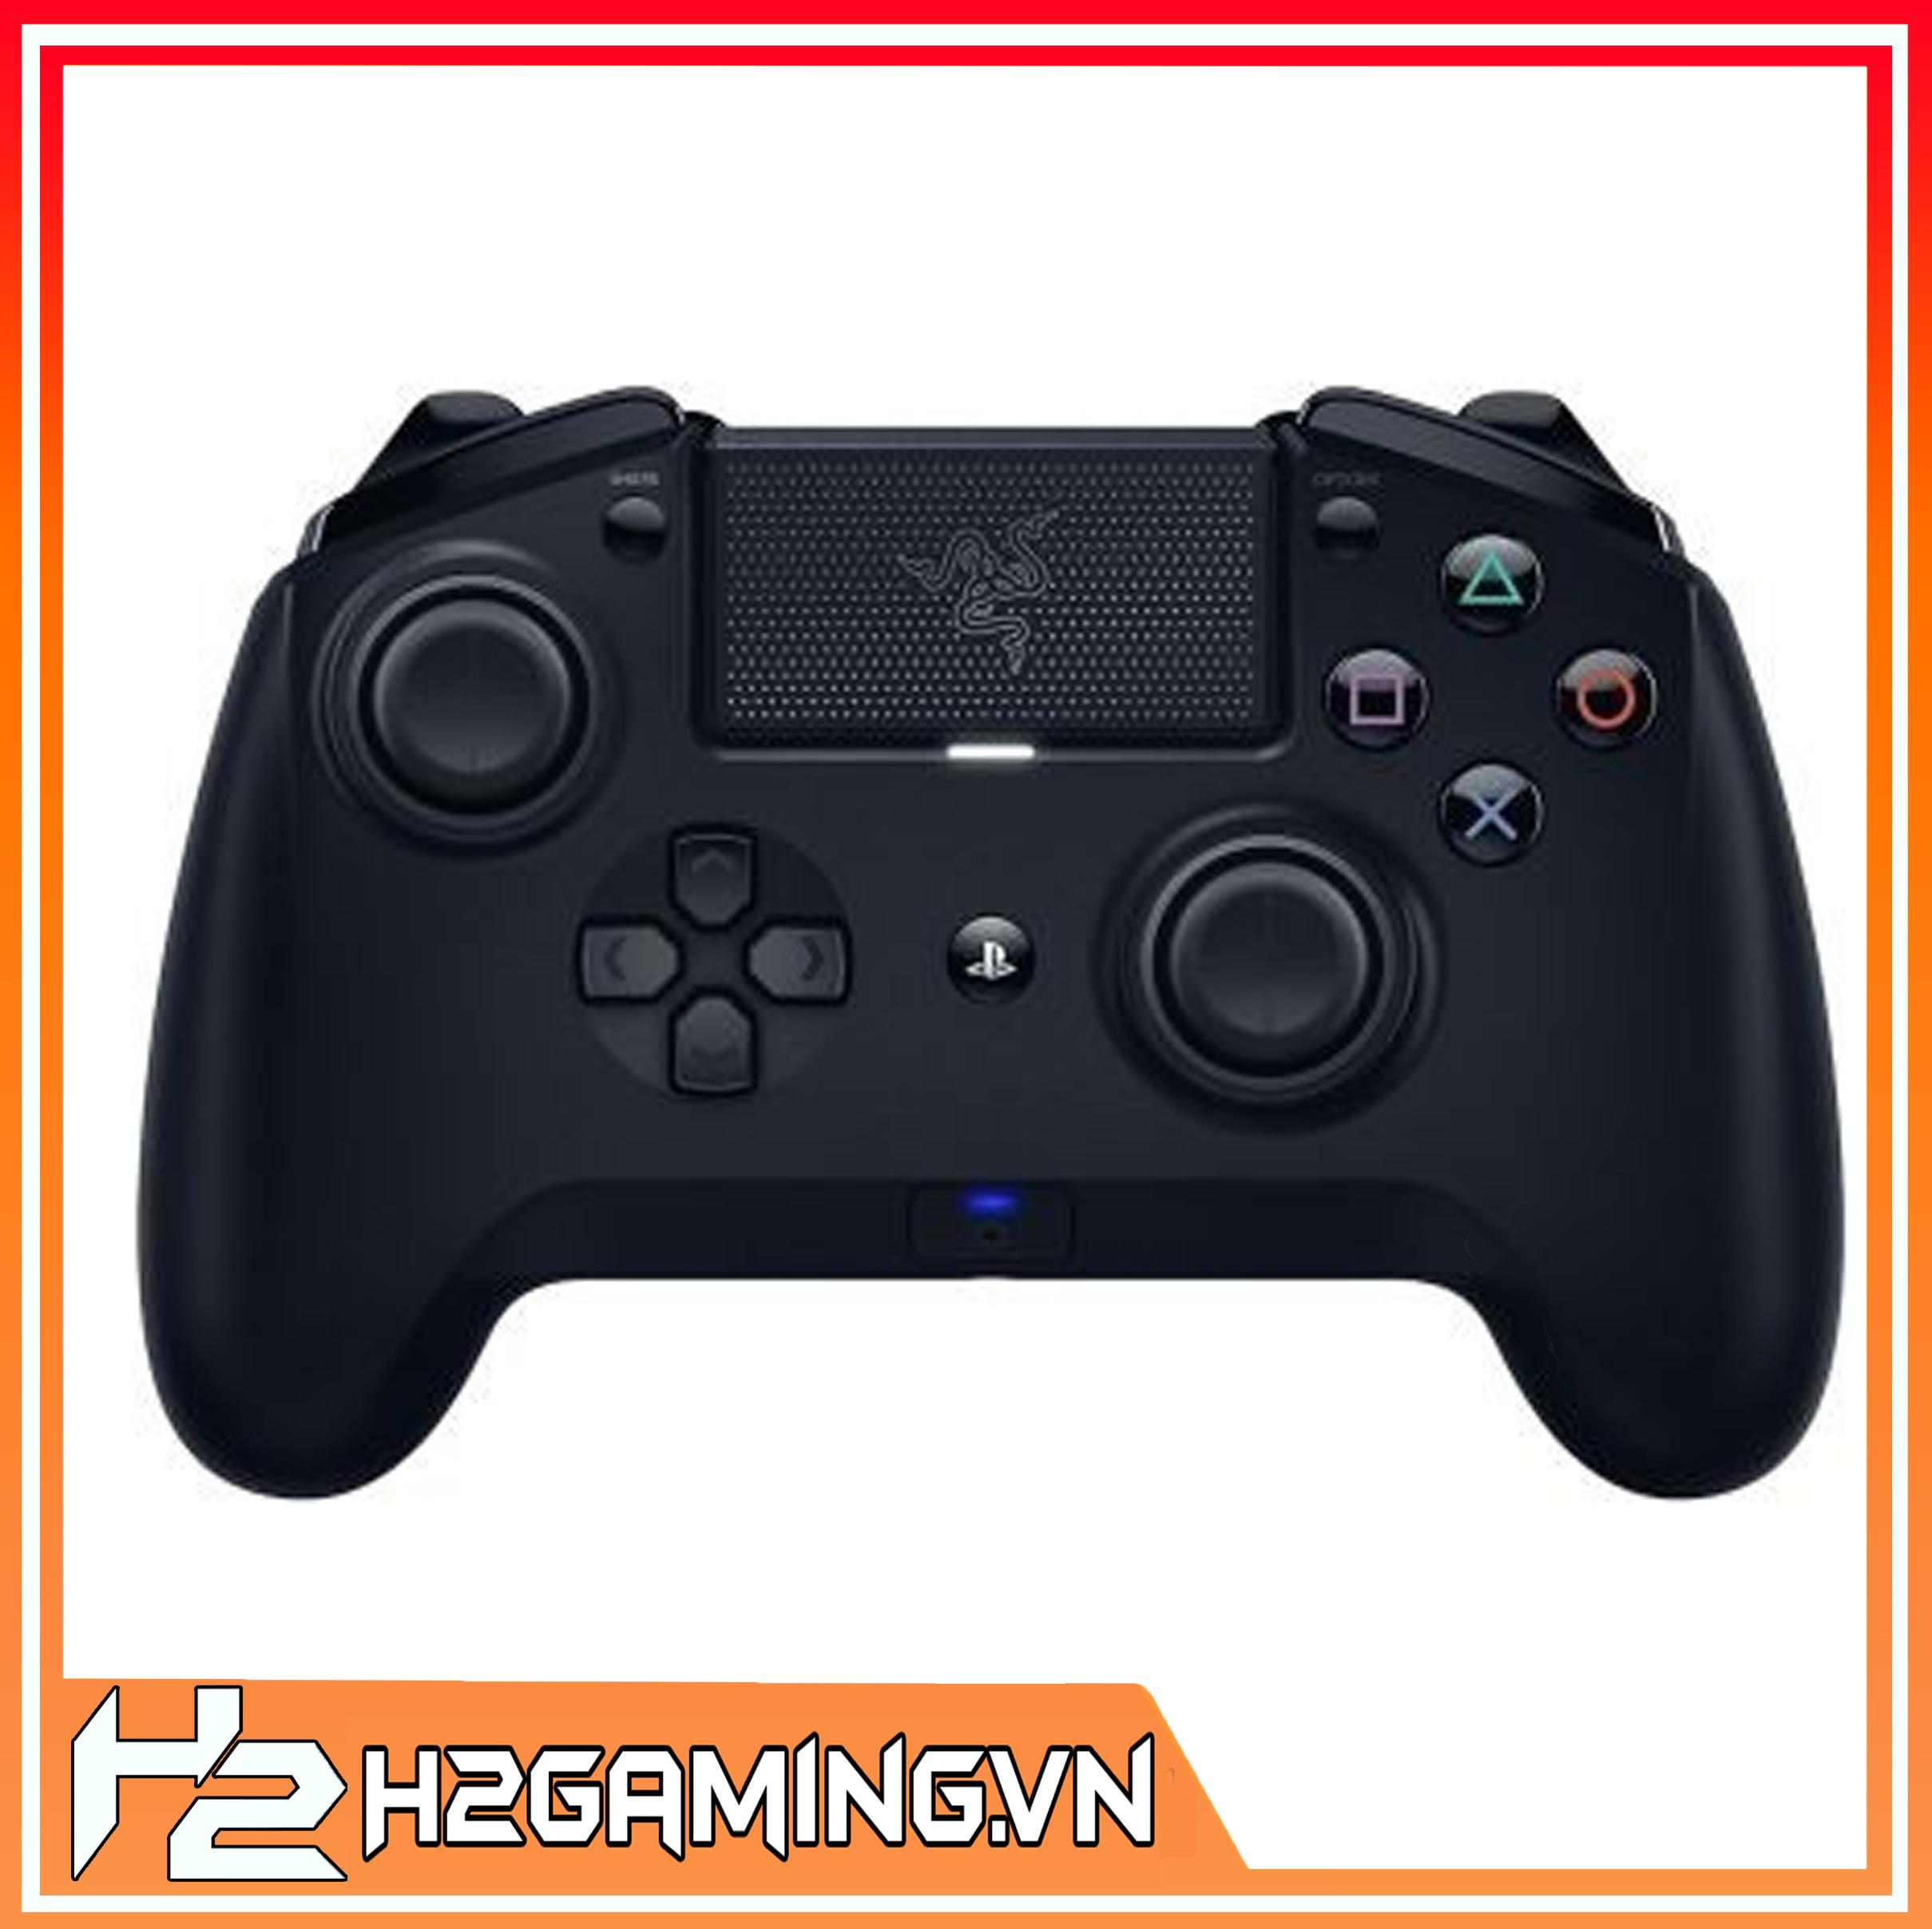 Razer_Raiju_PS4_Tournament_Edition_3